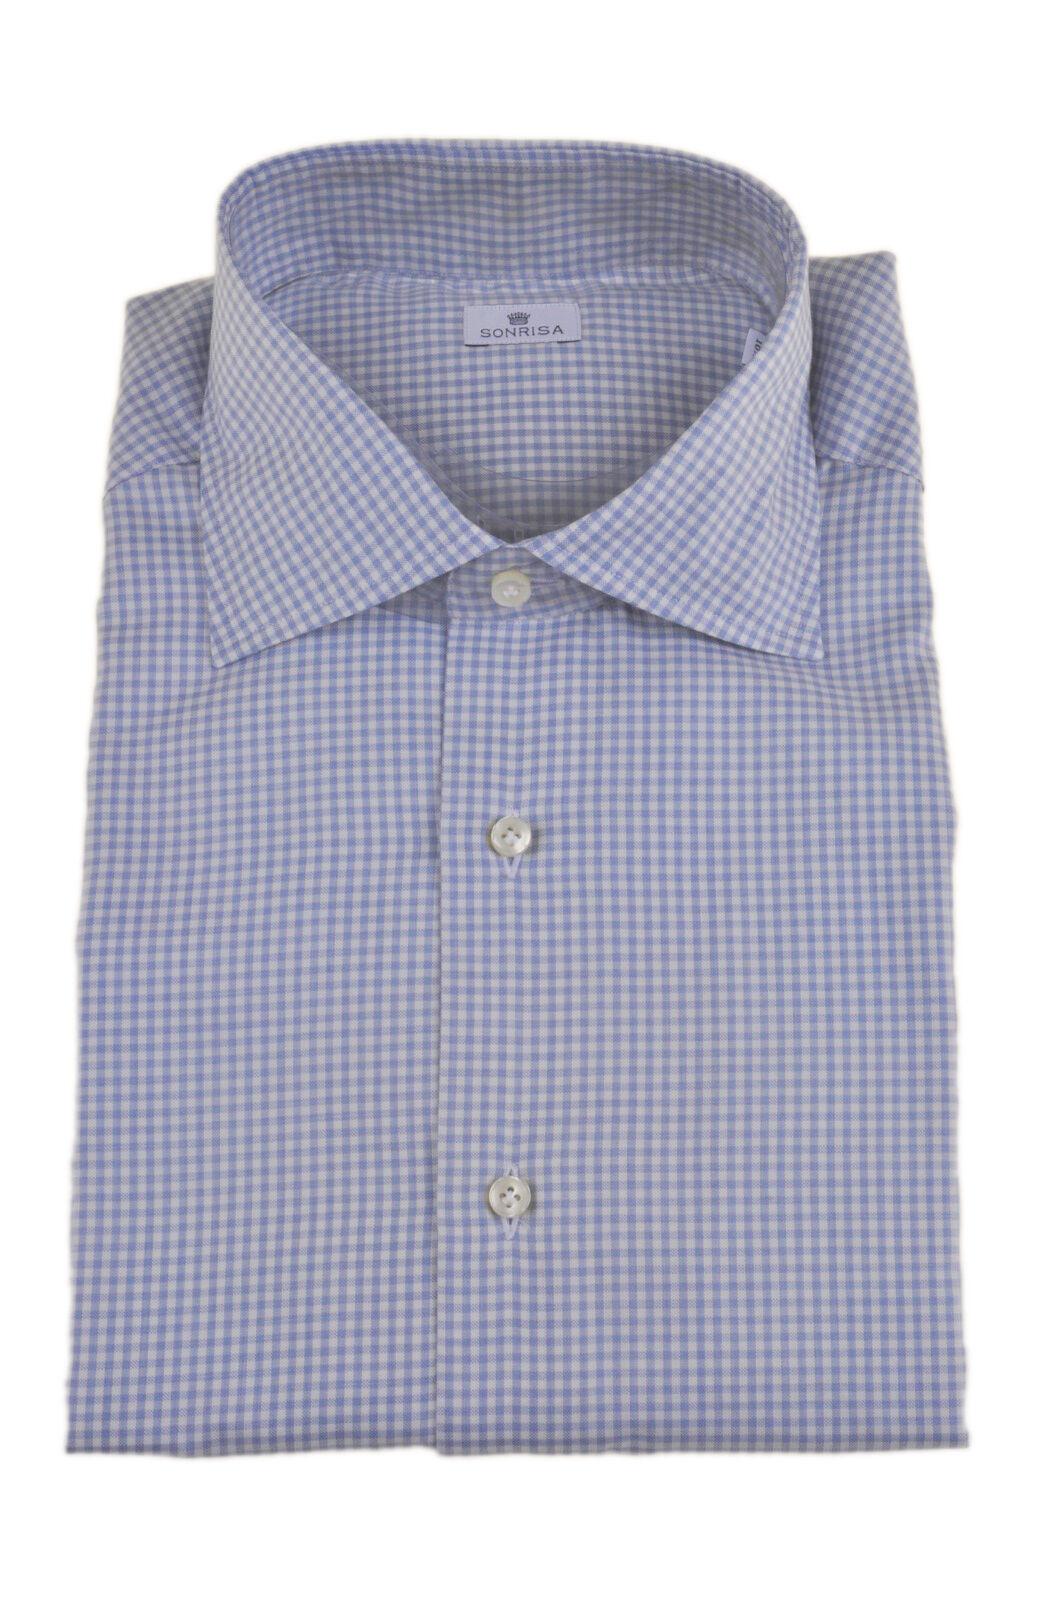 Sonrisa  -  Shirts - male - Weiß - 234226A181107